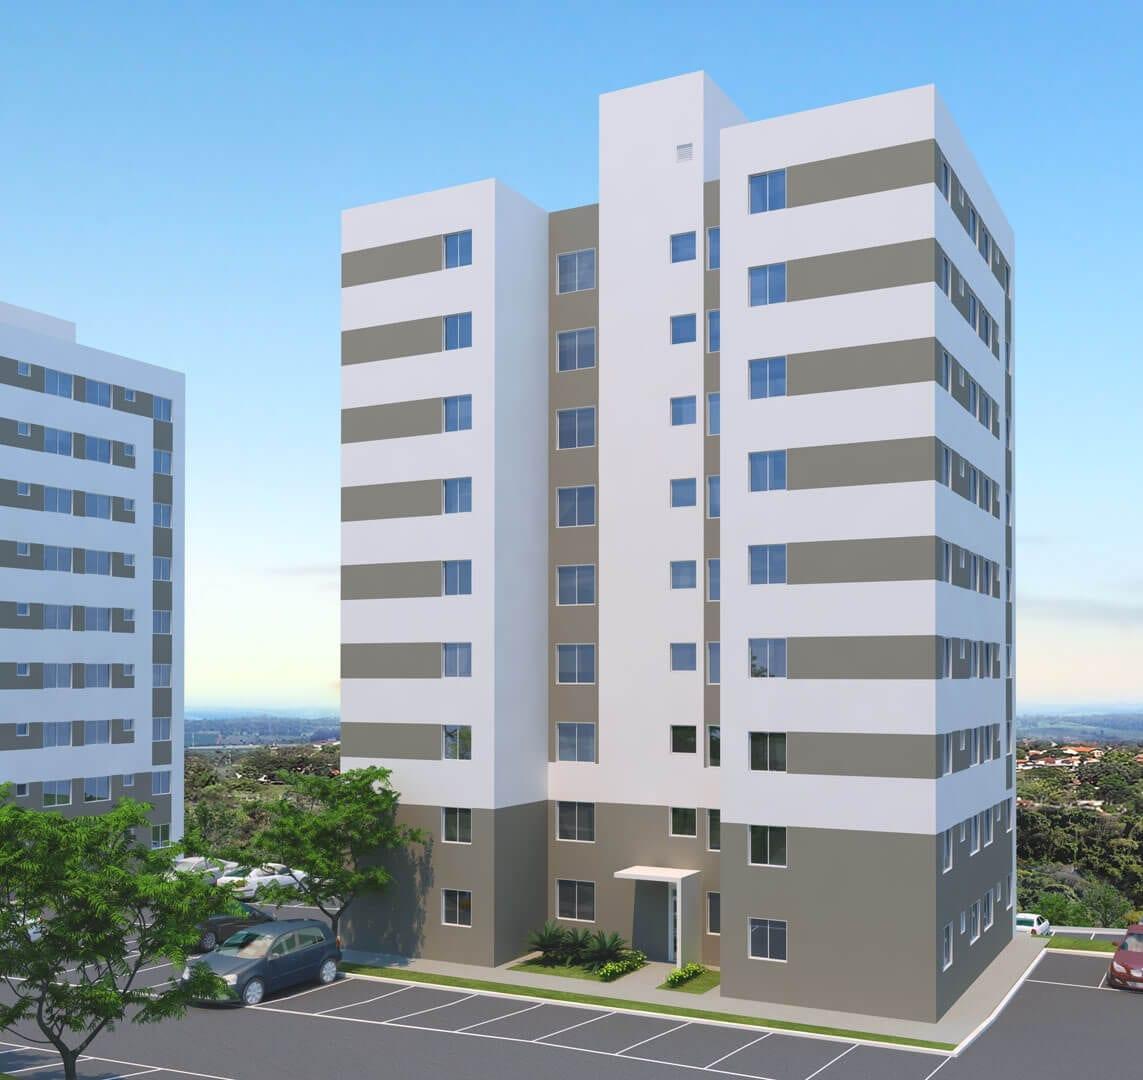 vic-engenharia-master-tower-siena-fachada